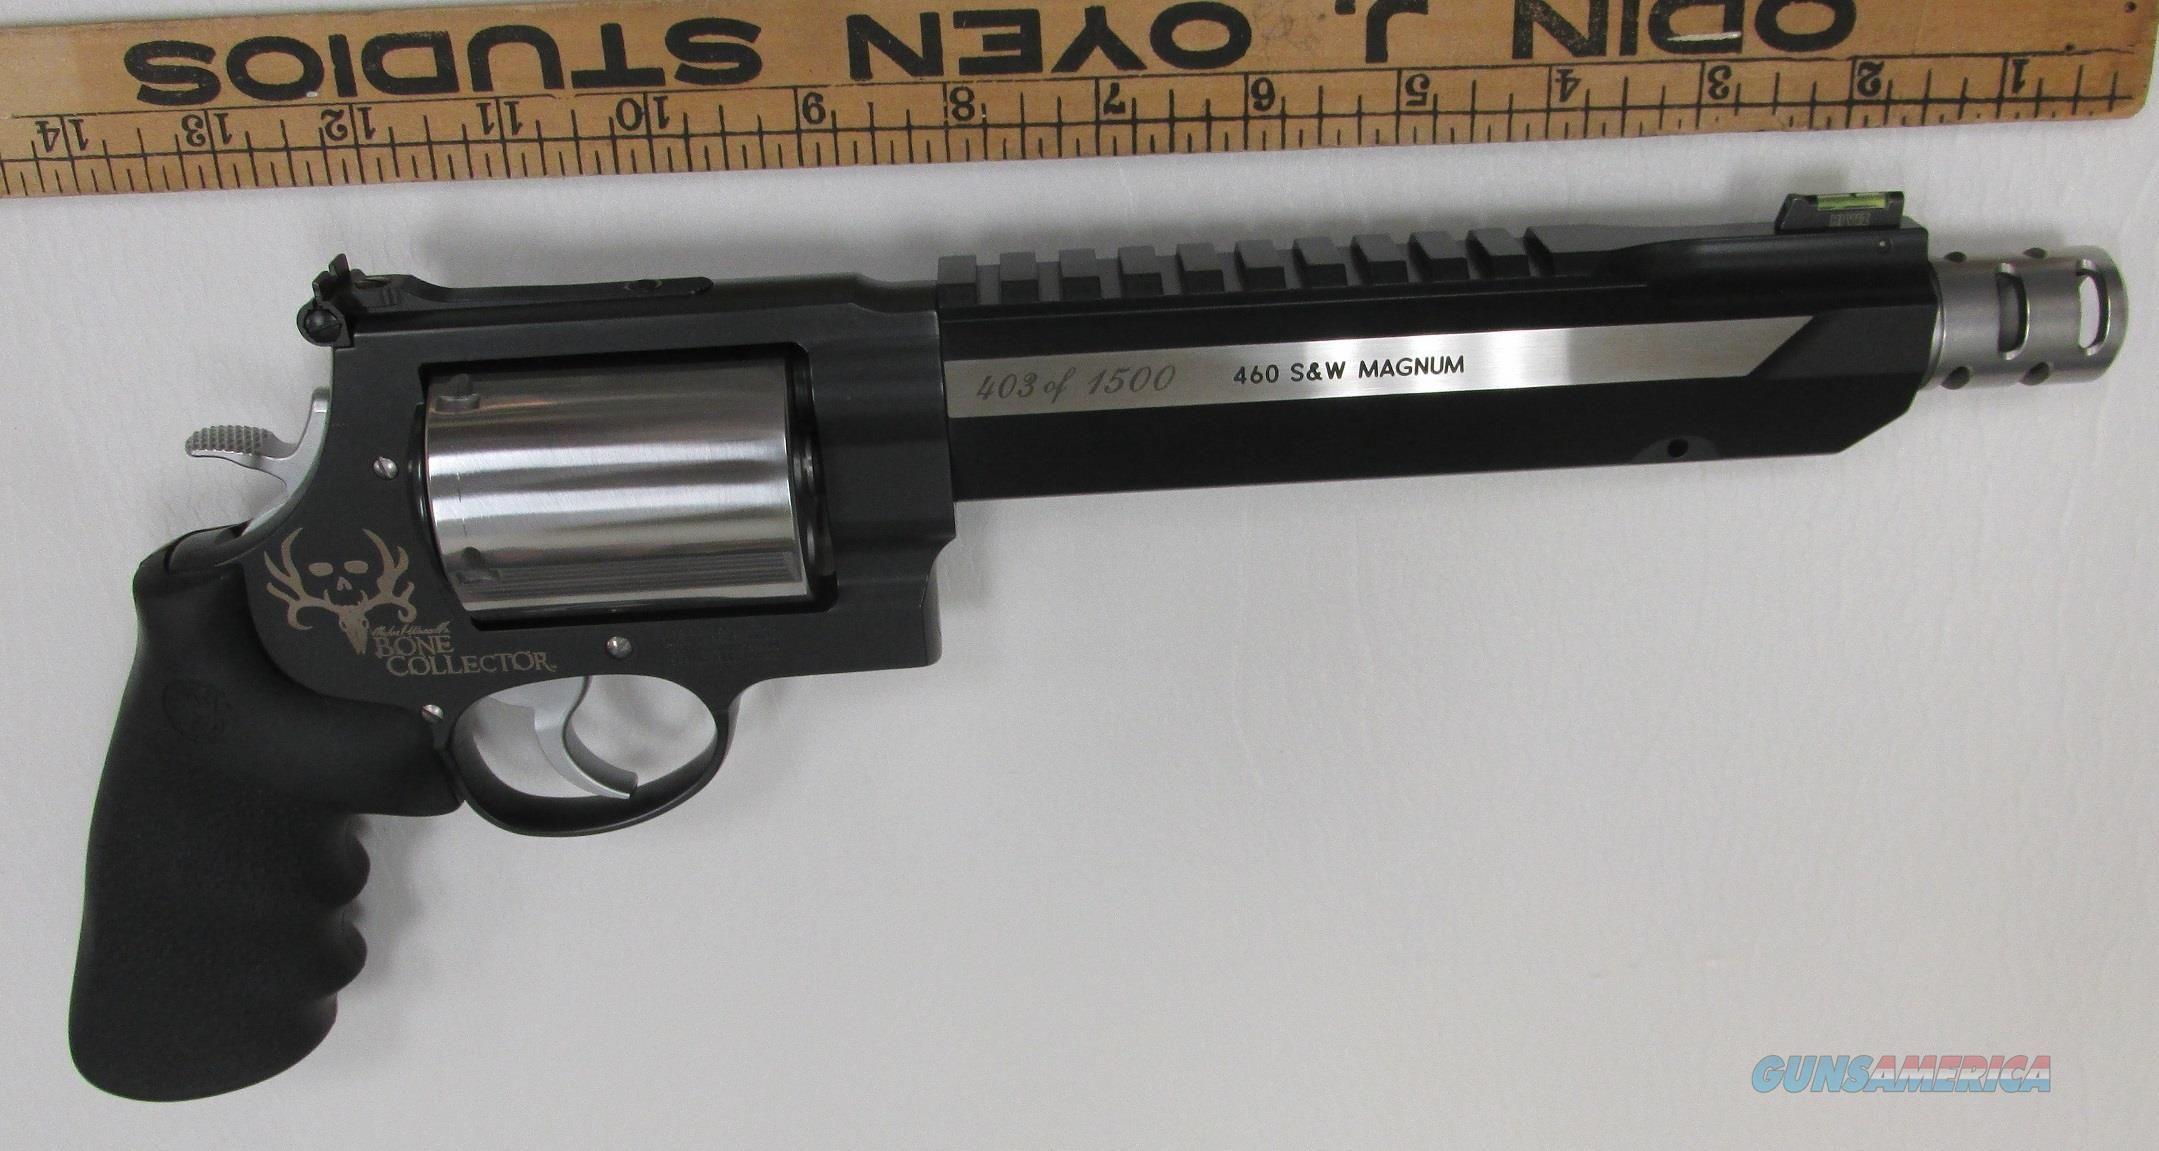 25023573f7 Smith & Wesson 460XVR Bone Collector Magnum Performance Center Revolver  ''7.5